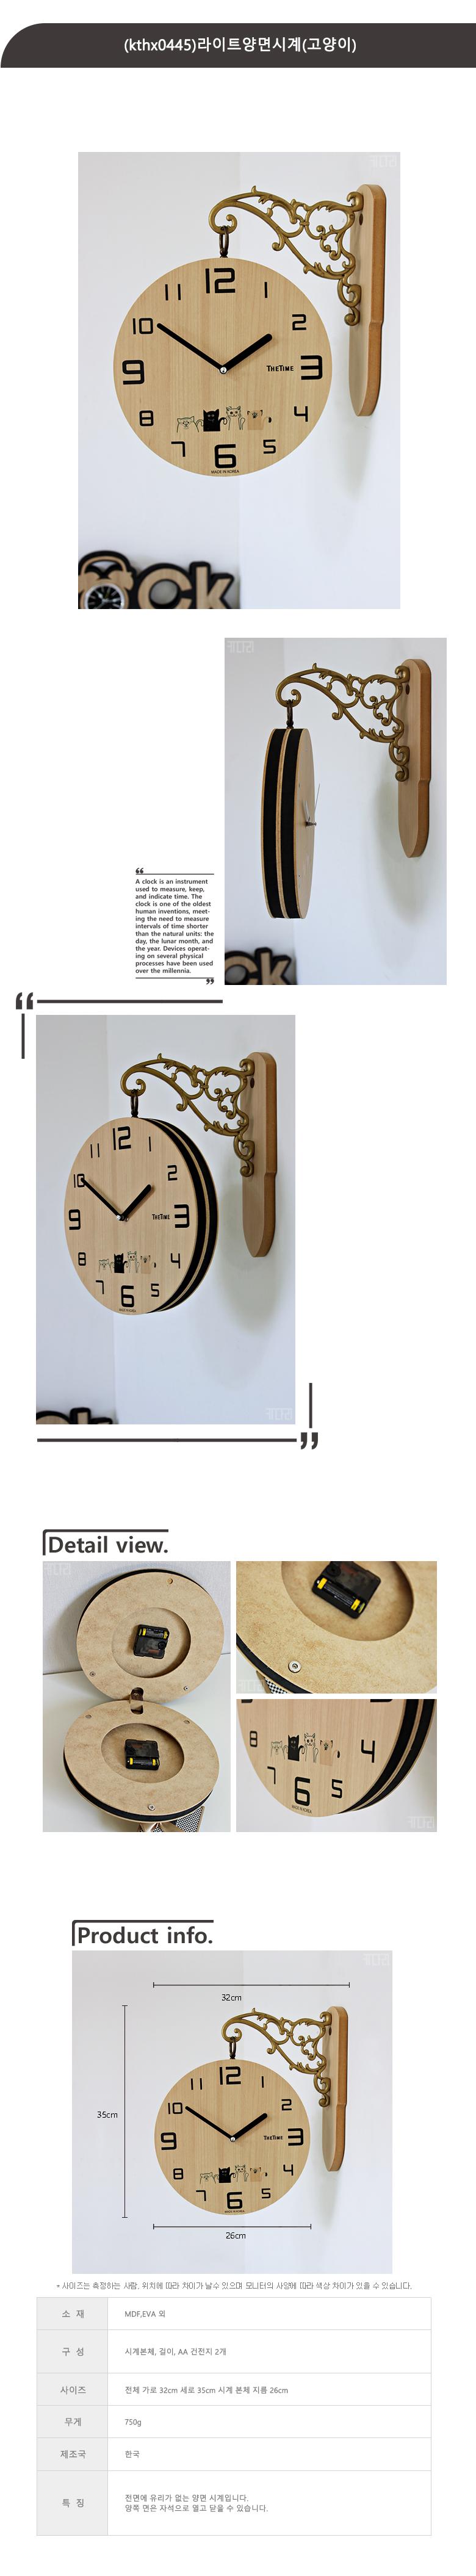 (kthx0445)라이트양면시계(고양이) - 키다리, 58,000원, 양면시계, 우드